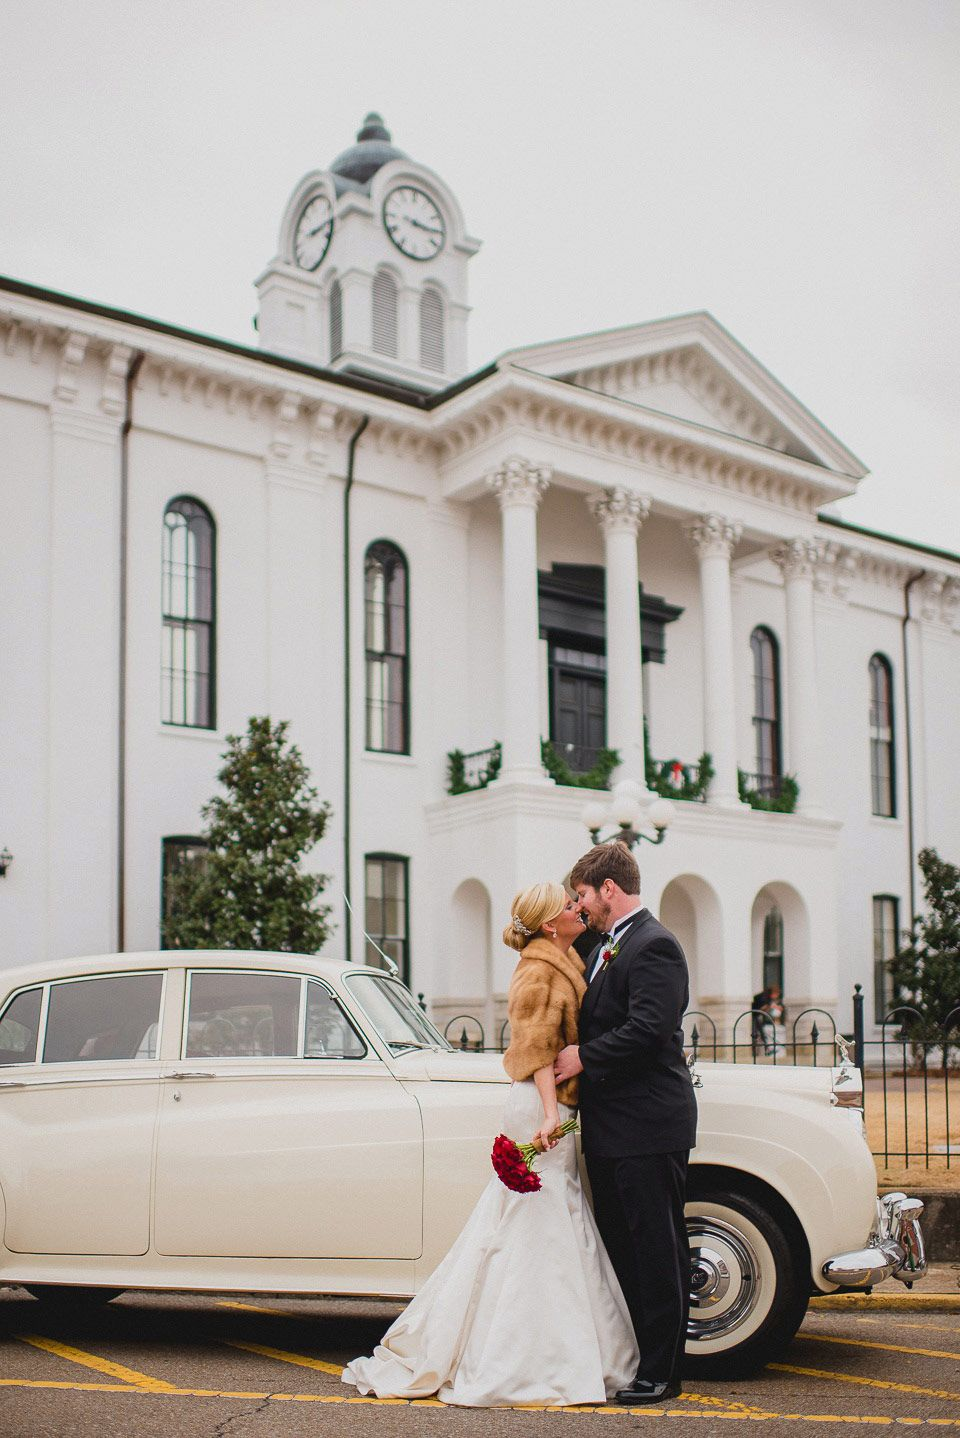 Courtney Brent Oxford Mississippi Wedding Photography Mississippi Wedding Wedding Photography Oxford Mississippi